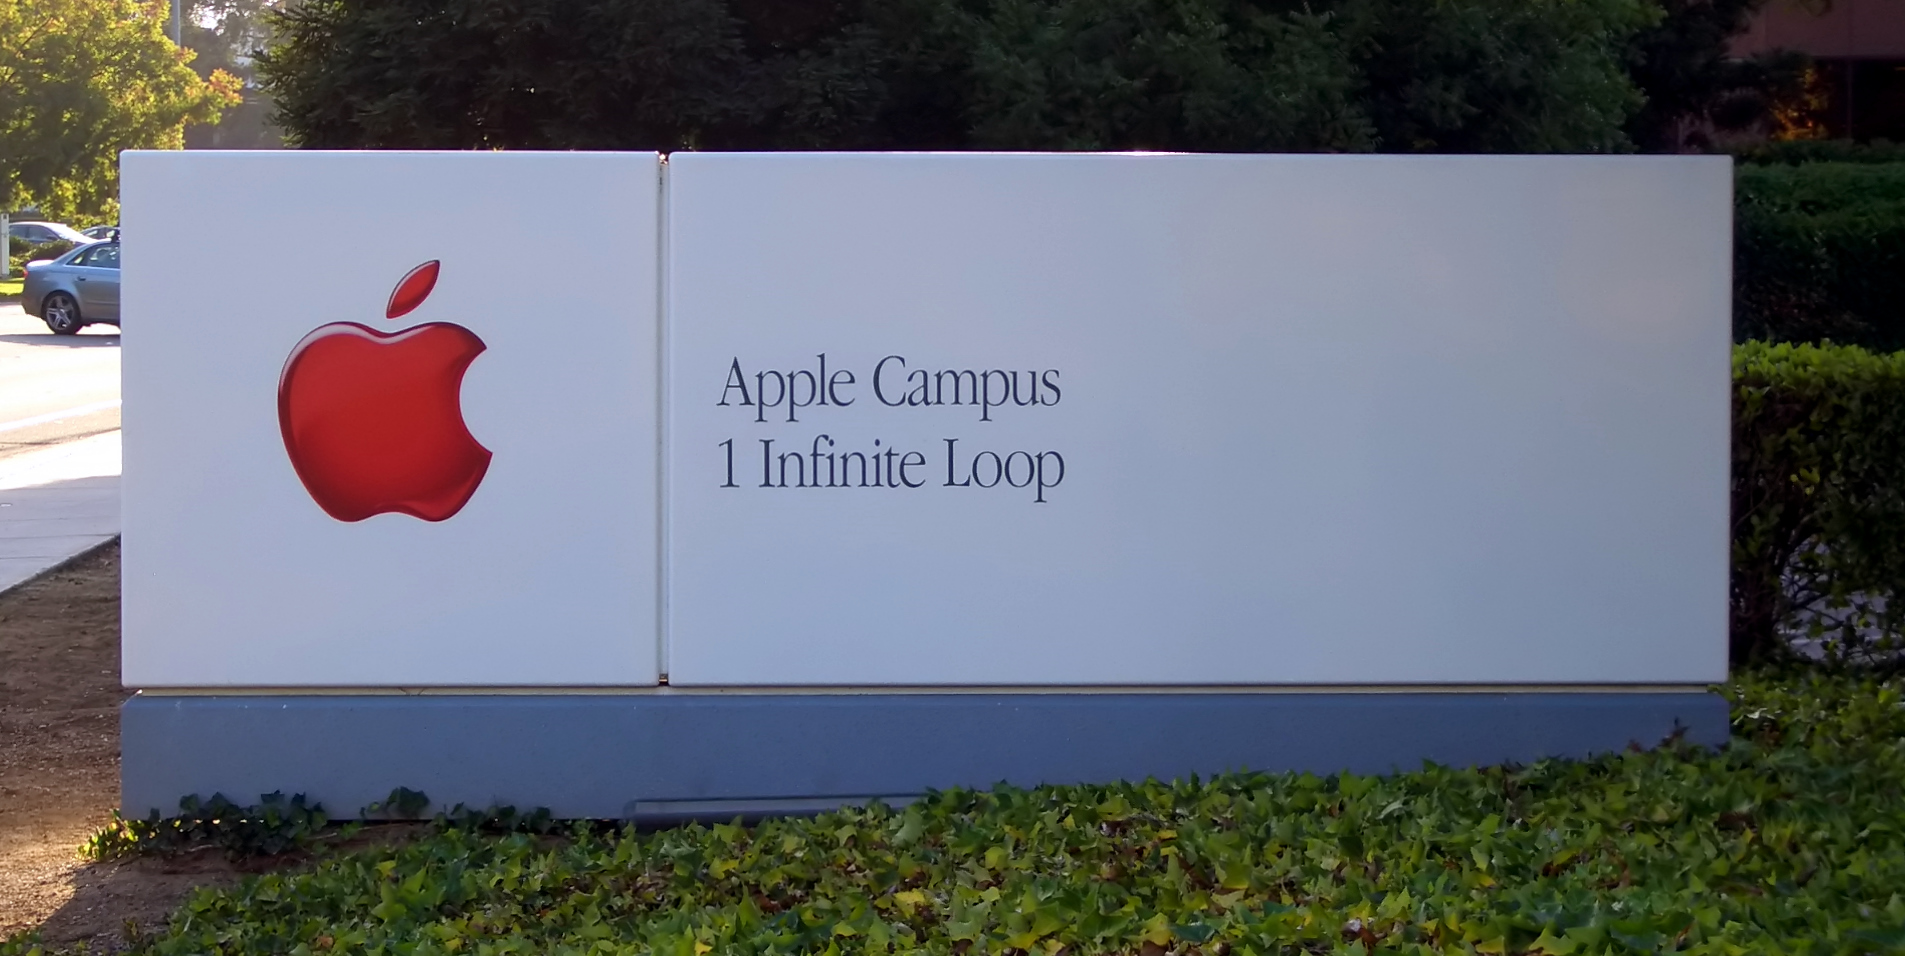 apple inc corporation Apple inc 19 likes computadoras y electronica  see more of apple inc on facebook.